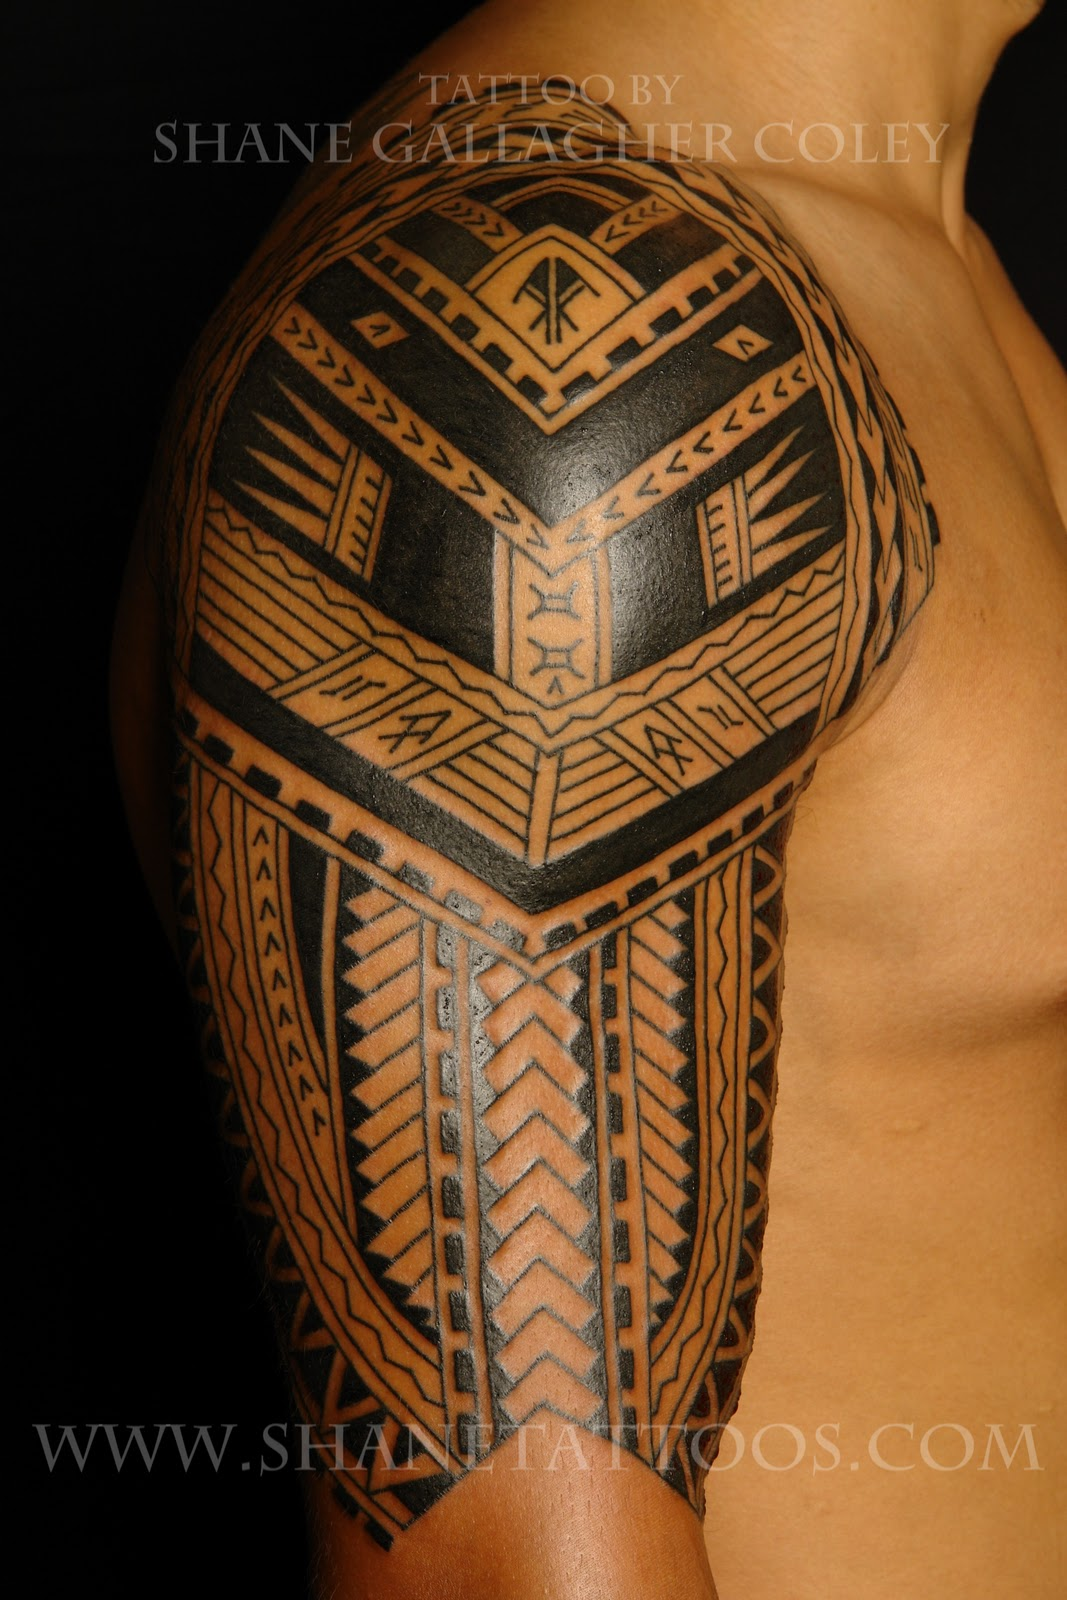 Samoan Tattoo: SHANE TATTOOS: Polynesian/Samoan Sleeve Tattoo (in Progress